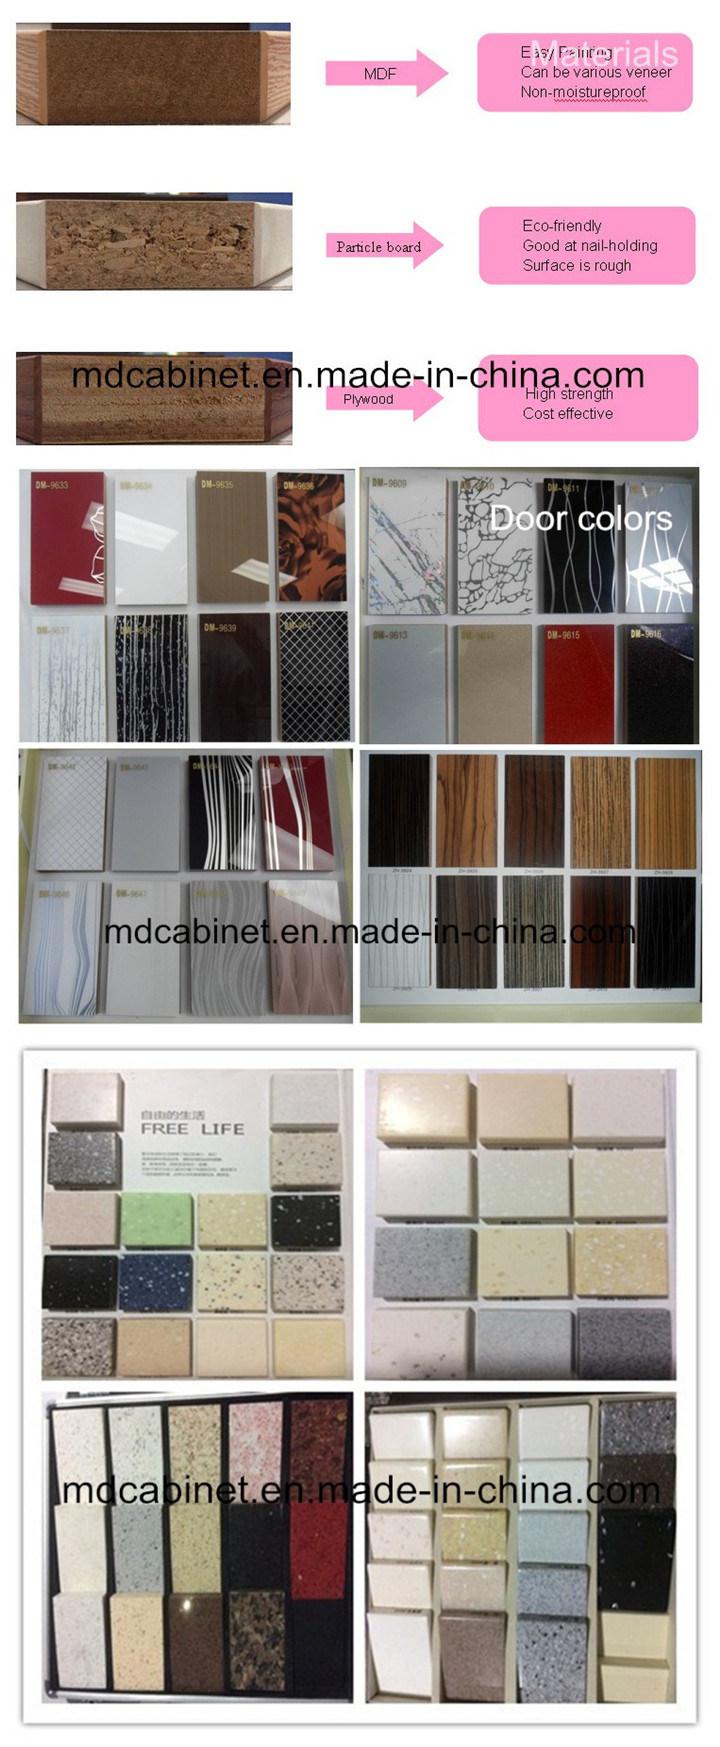 Marcas modernas do arm rio de cozinha da melamina marcas for Kitchen cabinet brand names